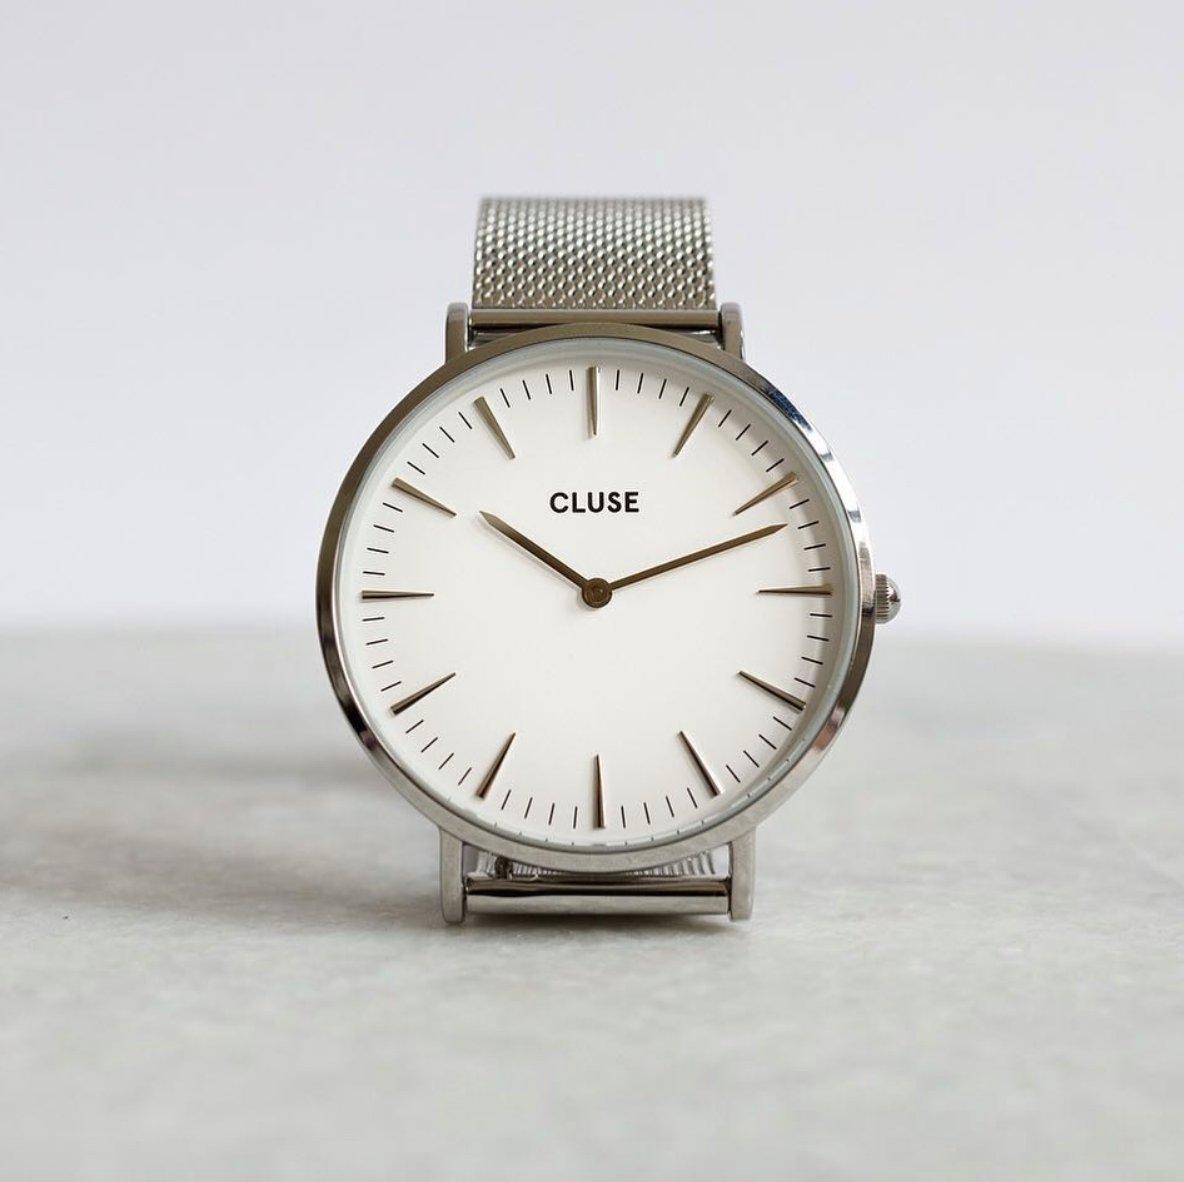 #Cluse #Regram - time to kickstart a new working week La Boheme Mesh Silver/White Watch £99 &gt;&gt;  http:// goo.gl/7Lc3SB  &nbsp;  <br>http://pic.twitter.com/EV5hivr1aX